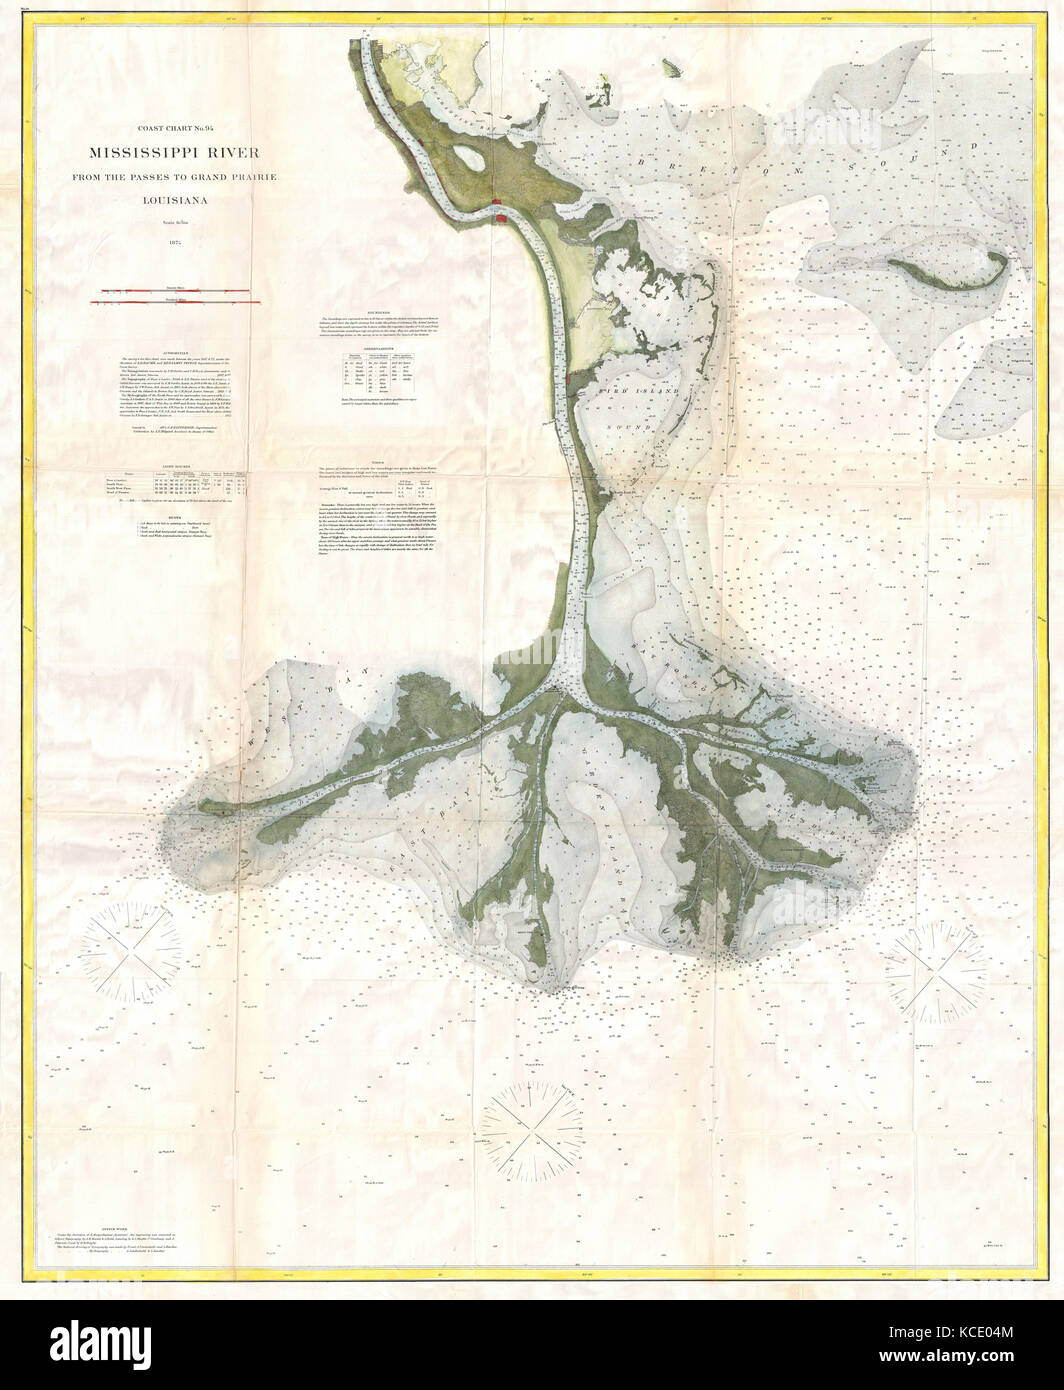 map of mississippi delta 1874 U S Coast Survey Map Of The Mississippi Delta Stock Photo map of mississippi delta